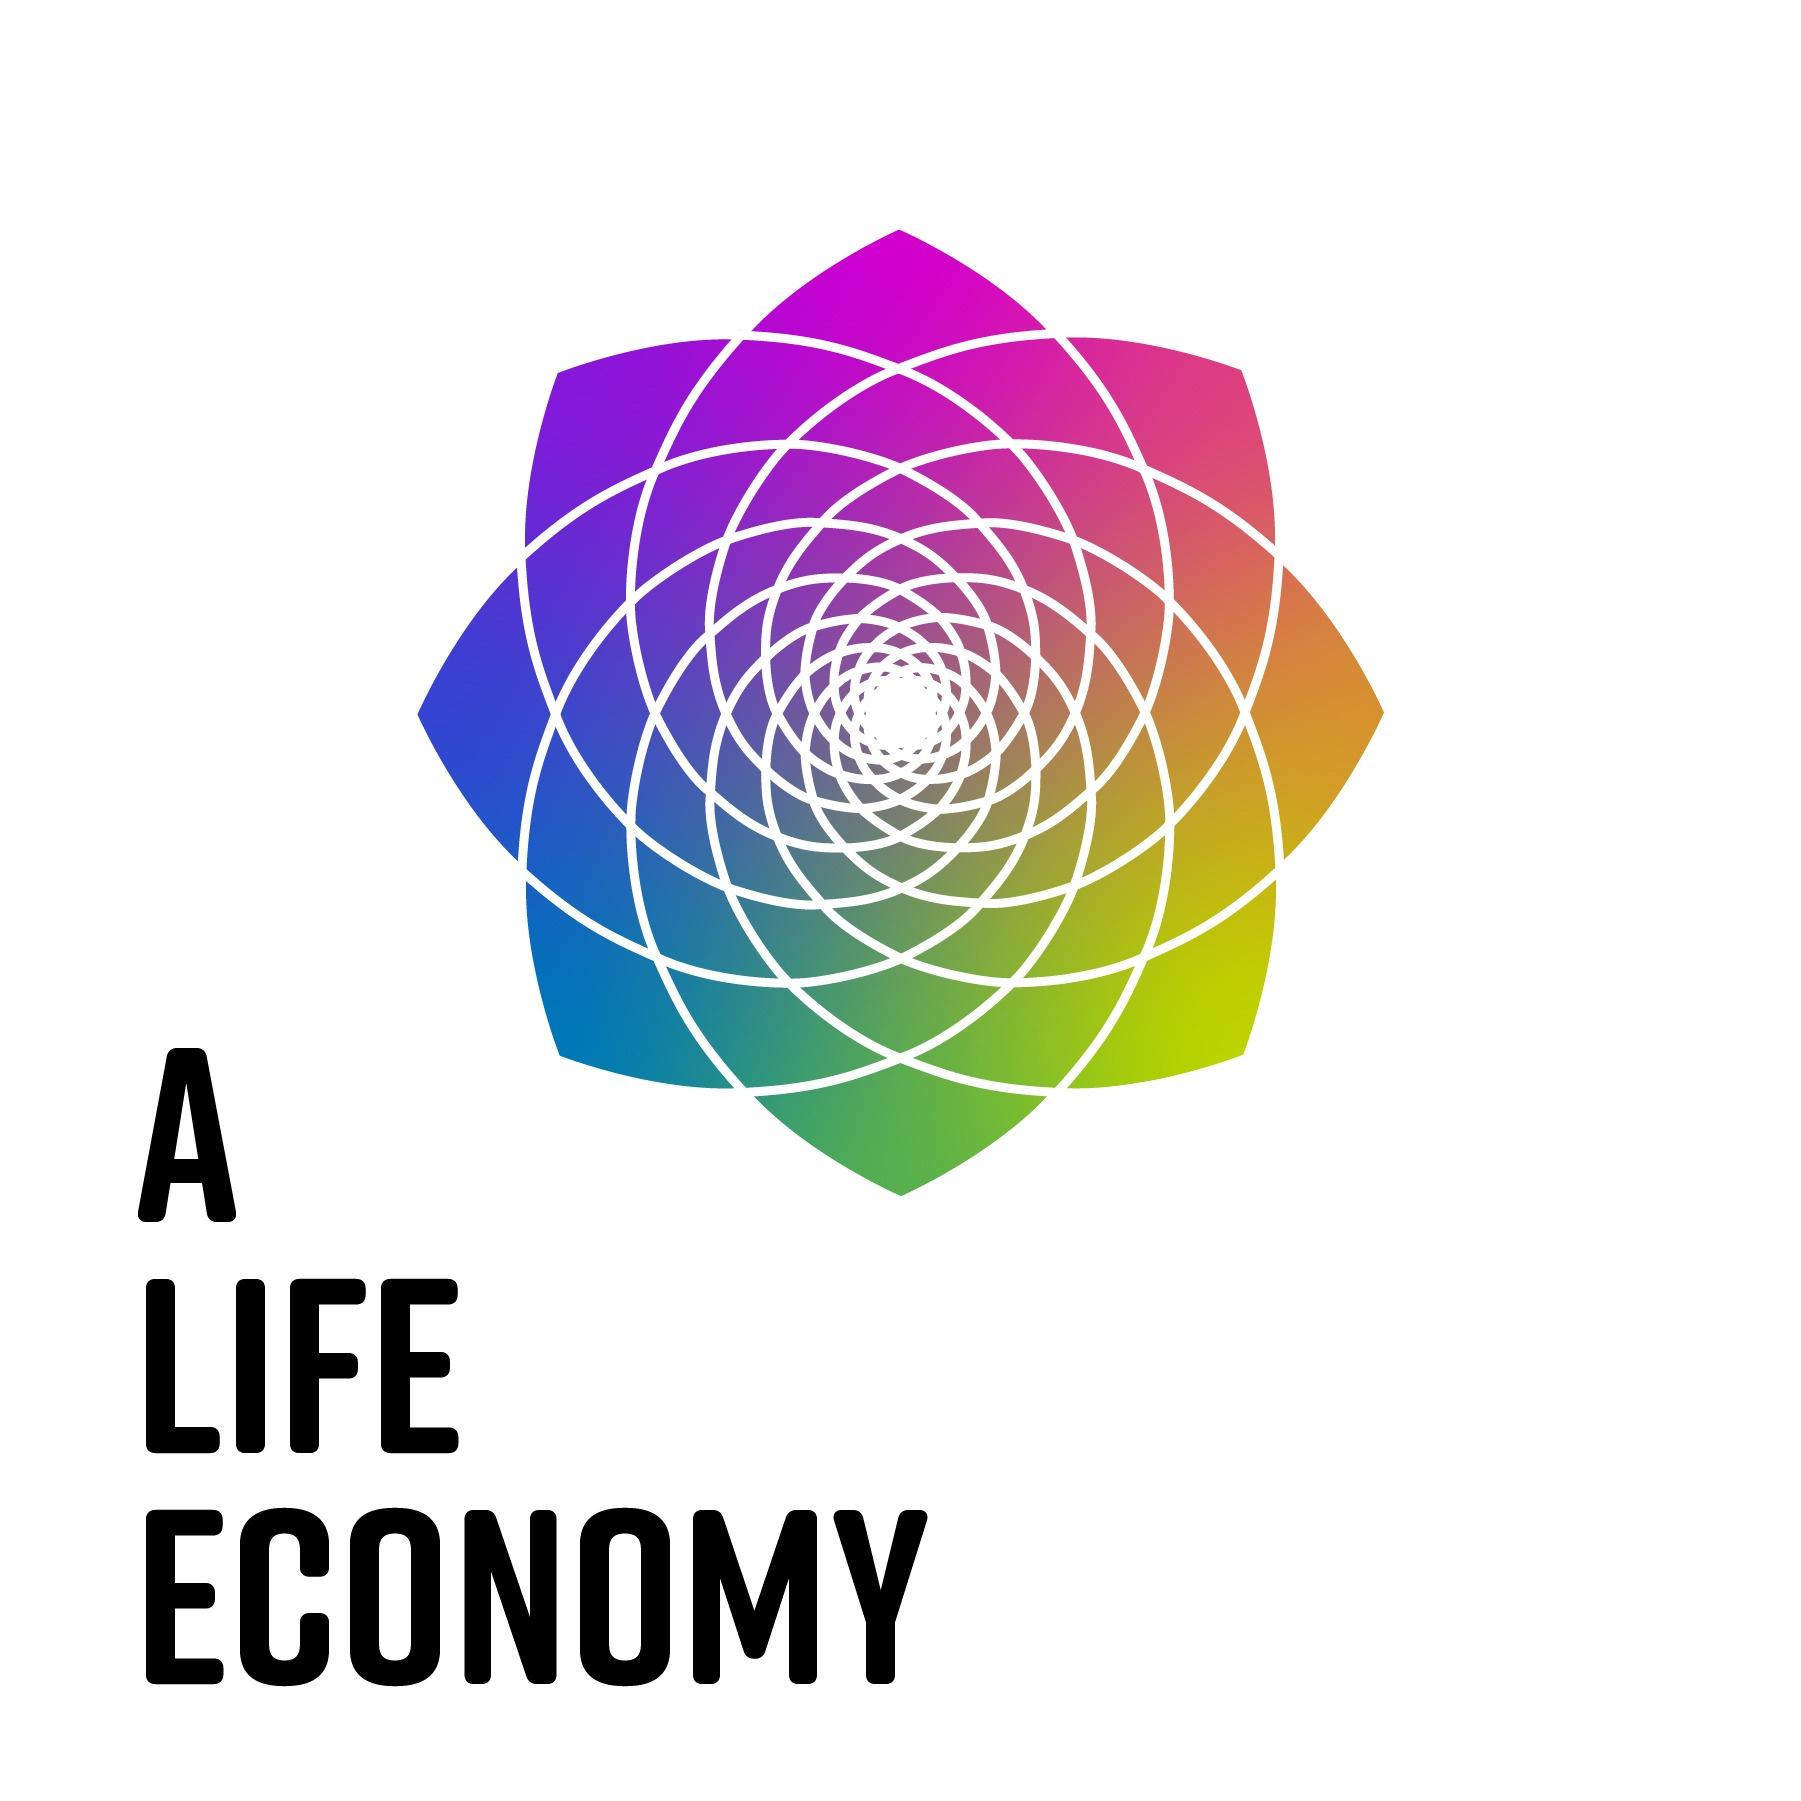 A Life Economy